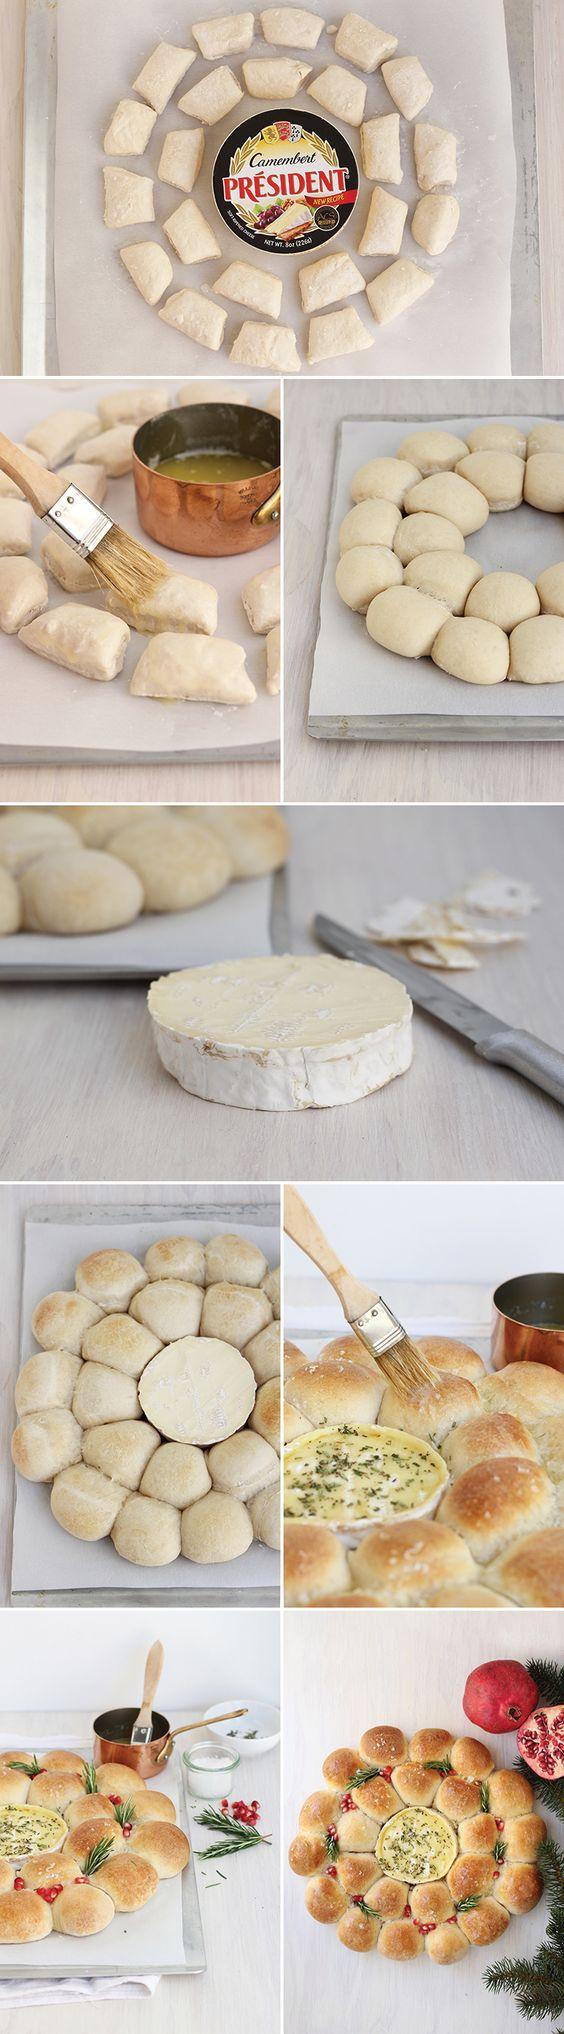 How to assemble a Baked Camembert Bread Wreath! @presidentcheese #ArtofCheese